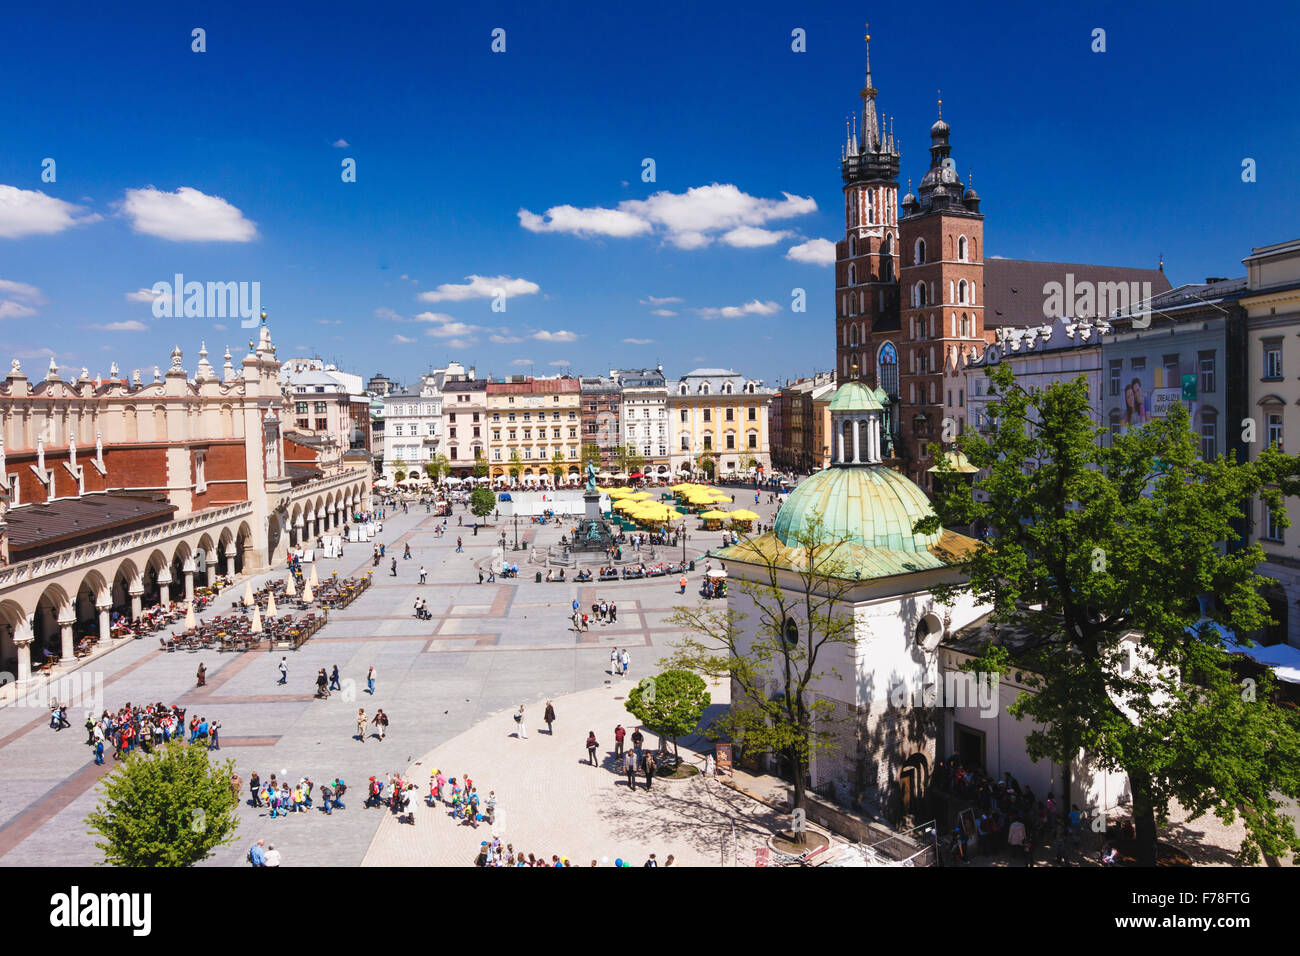 High view of Krakow main Market Square. Krakow, Poland Stock Photo